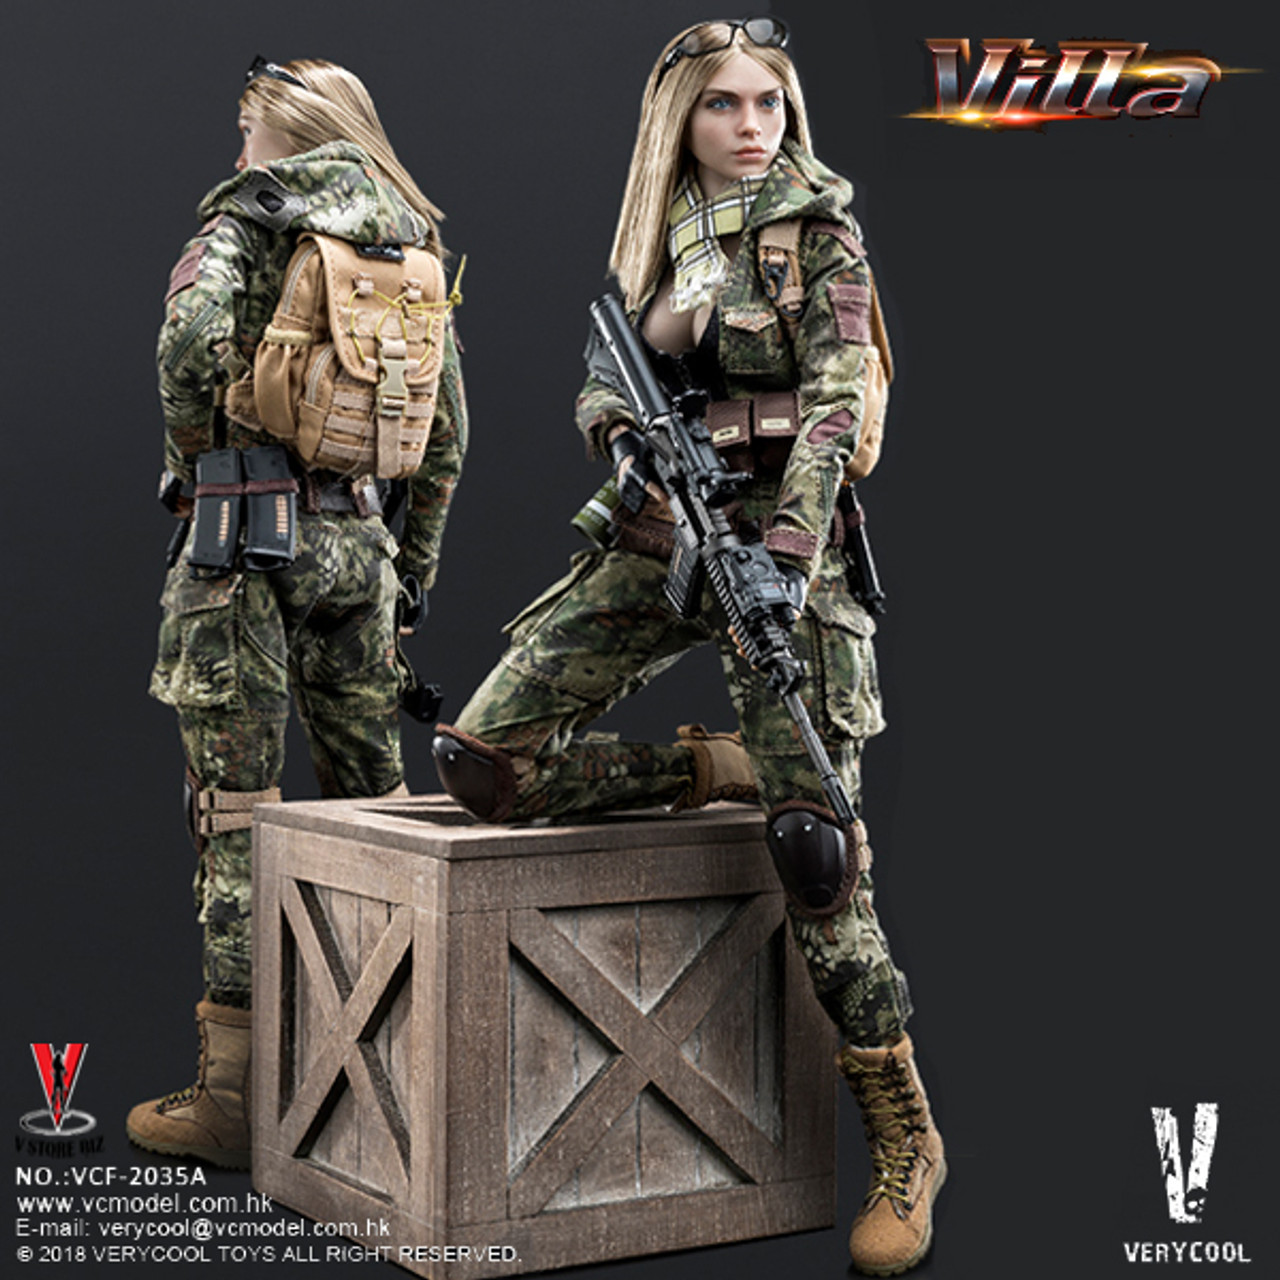 VERYCOOL Boots MC CAMO WOMEN SOLDIER VILLA 1//6 ACTION FIGURE TOYS dam vts did